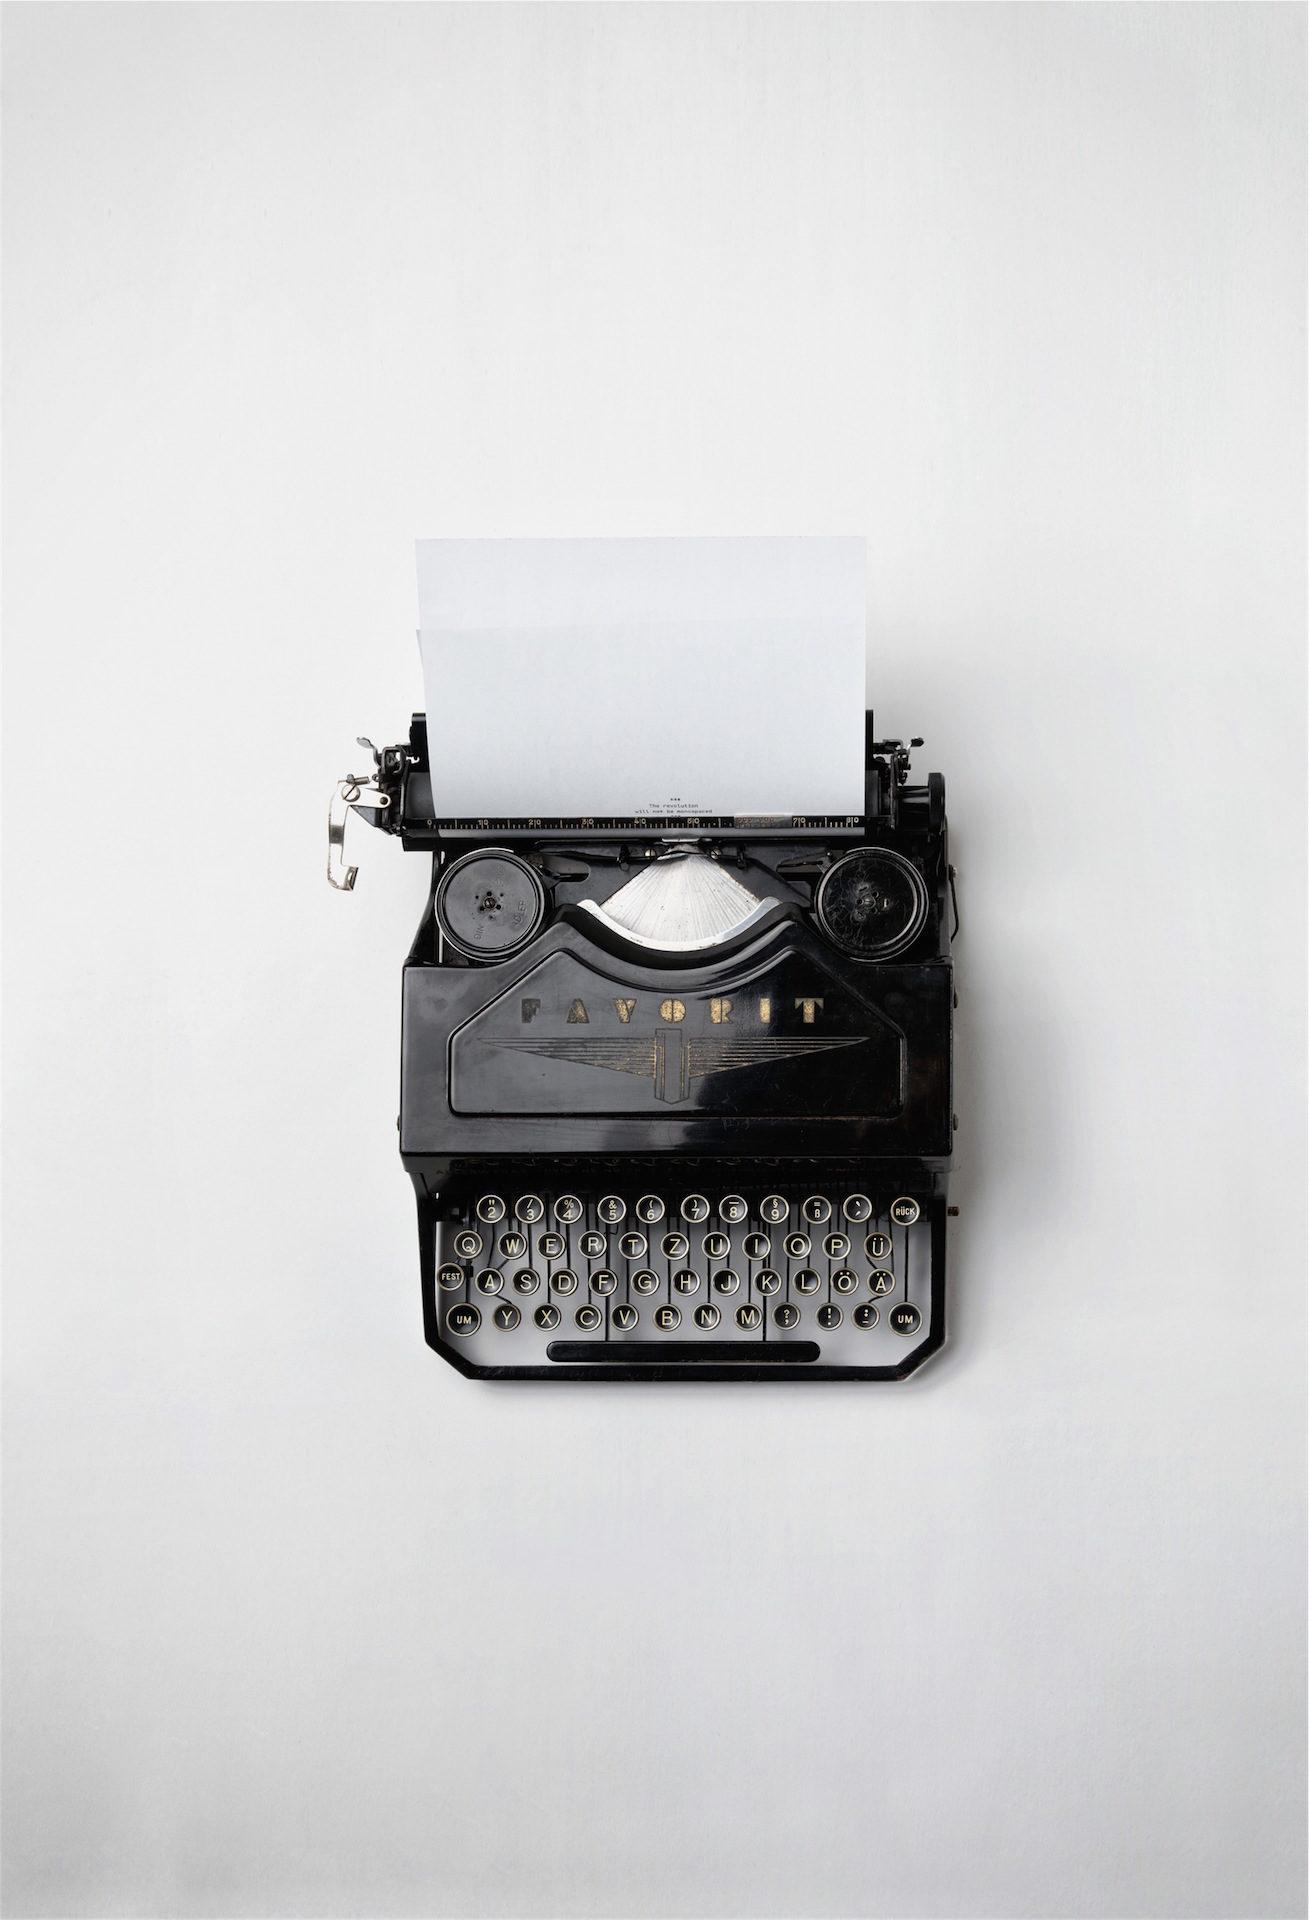 máquina, escribir, minimalista, antigua, vintage - Fondos de Pantalla HD - professor-falken.com